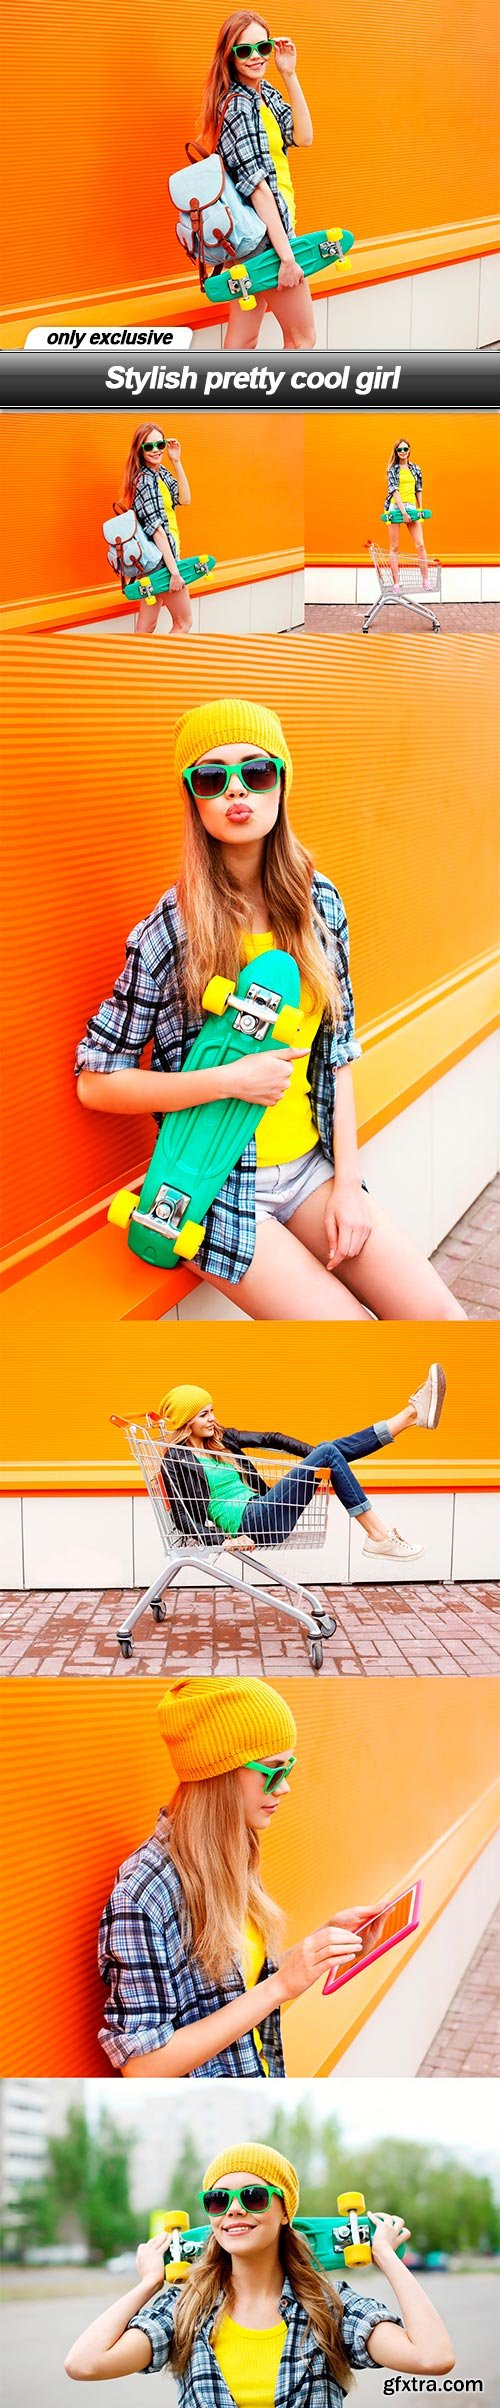 Stylish pretty cool girl - 6 UHQ JPEG